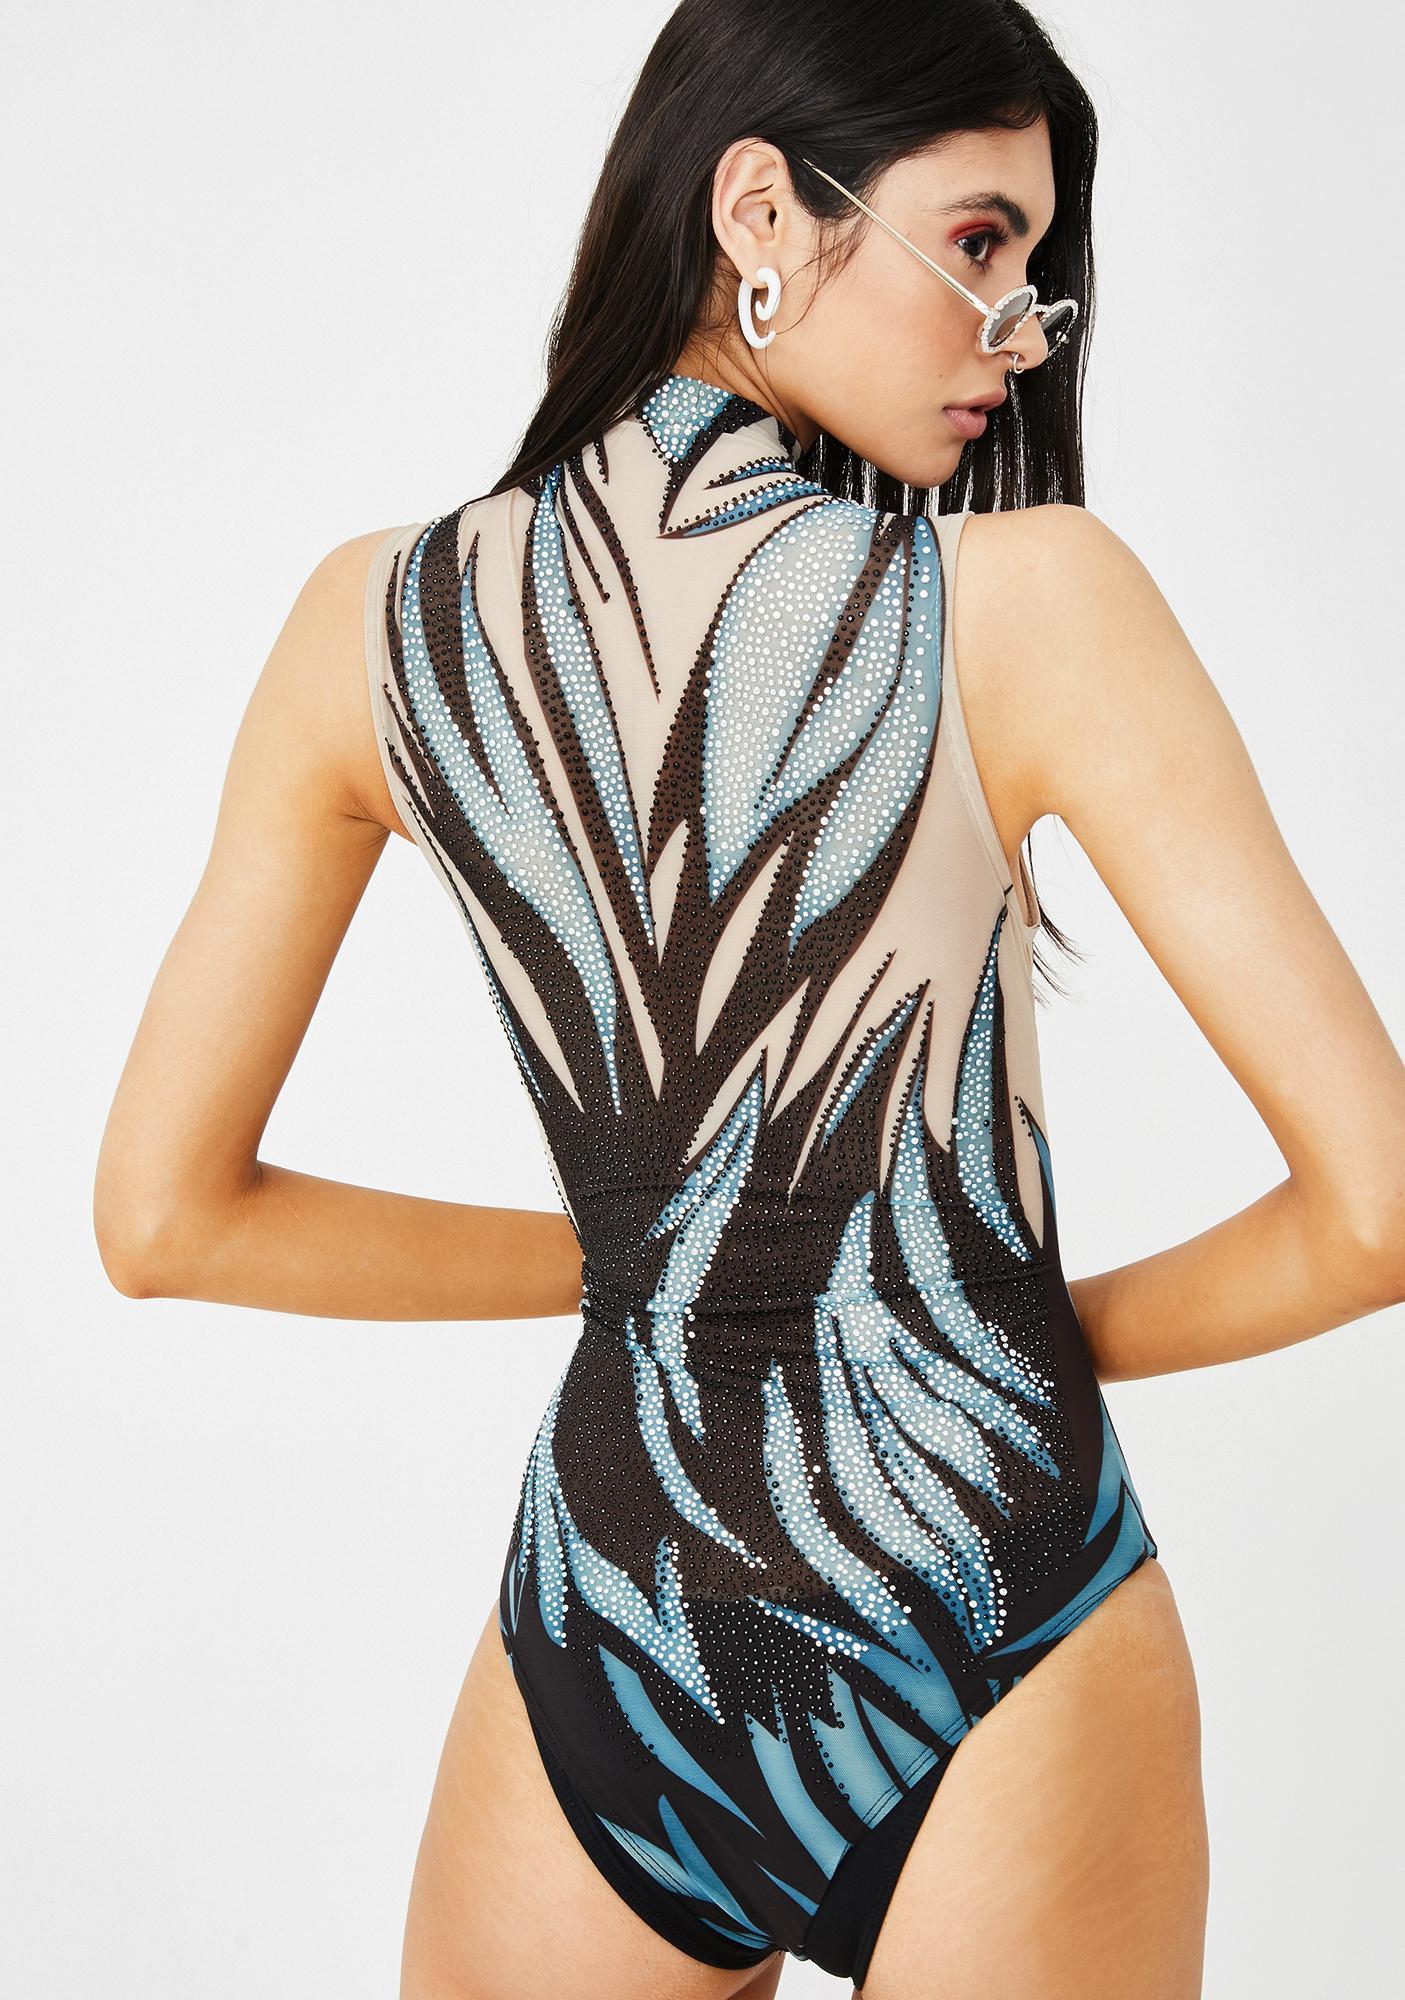 Kiki Riki Feather Duster Rhinestone Bodysuit